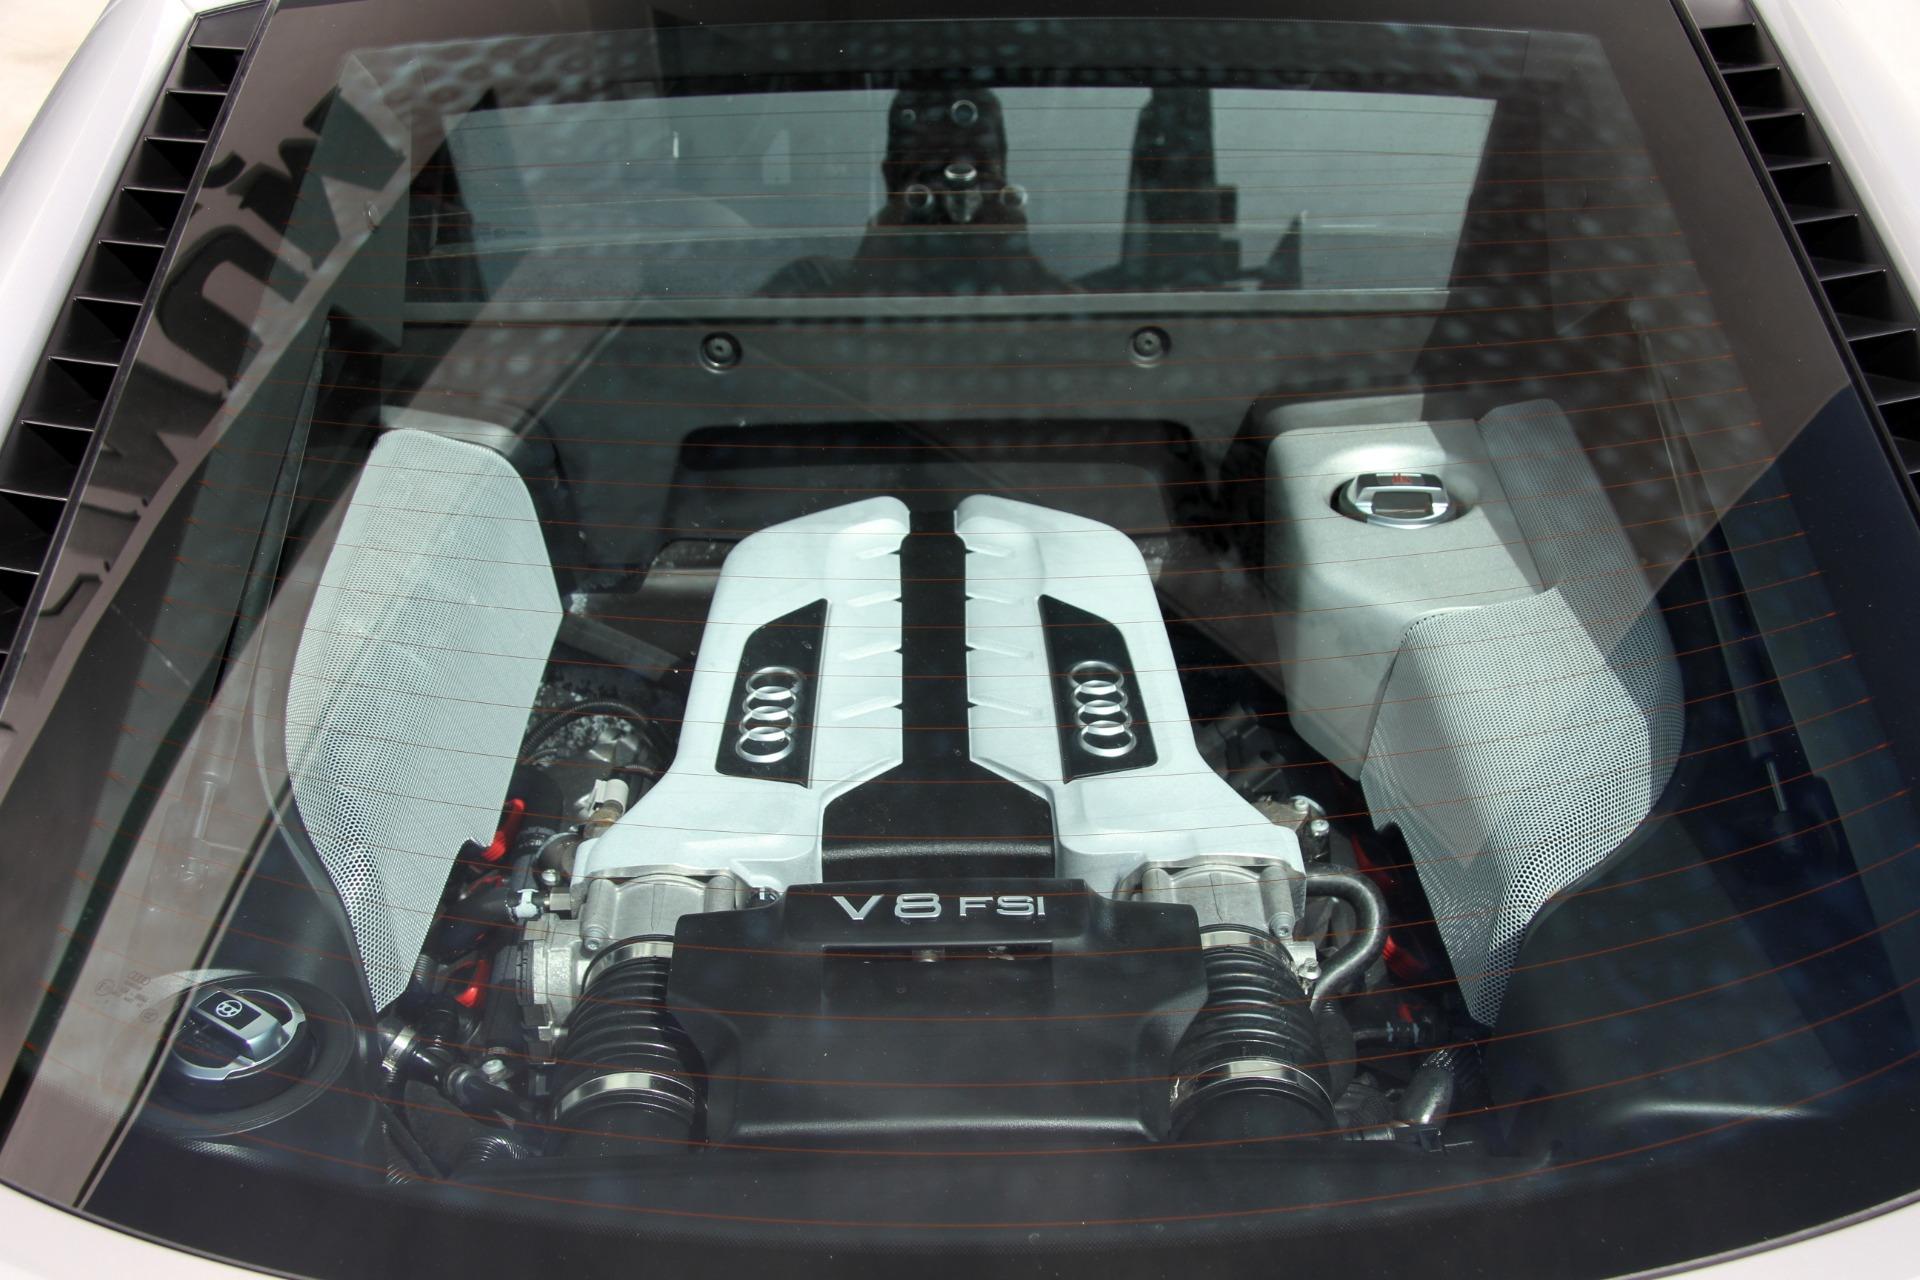 Audi Dealer Near Me >> 2012 Audi R8 4.2 quattro *** RARE MANUAL TRANSMISSION ...